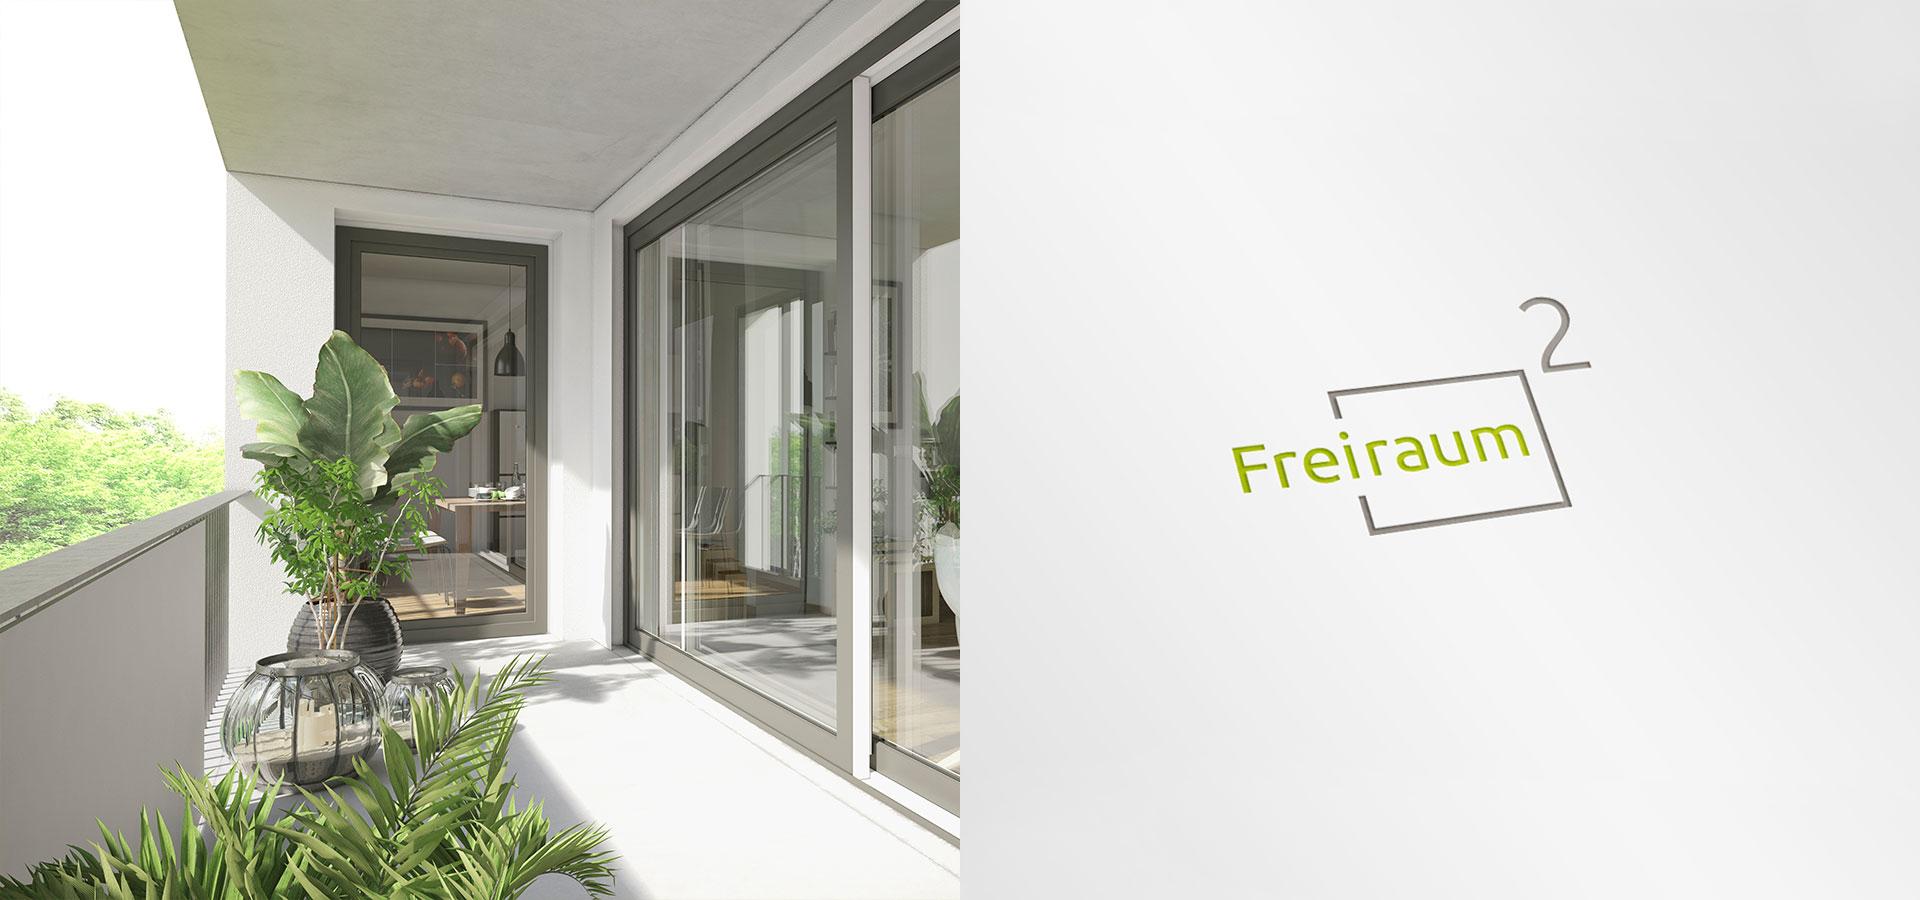 OPUS Marketing / Immobilienmarketing / Markenaufbau / Logo / Herleitung / Freiraum²